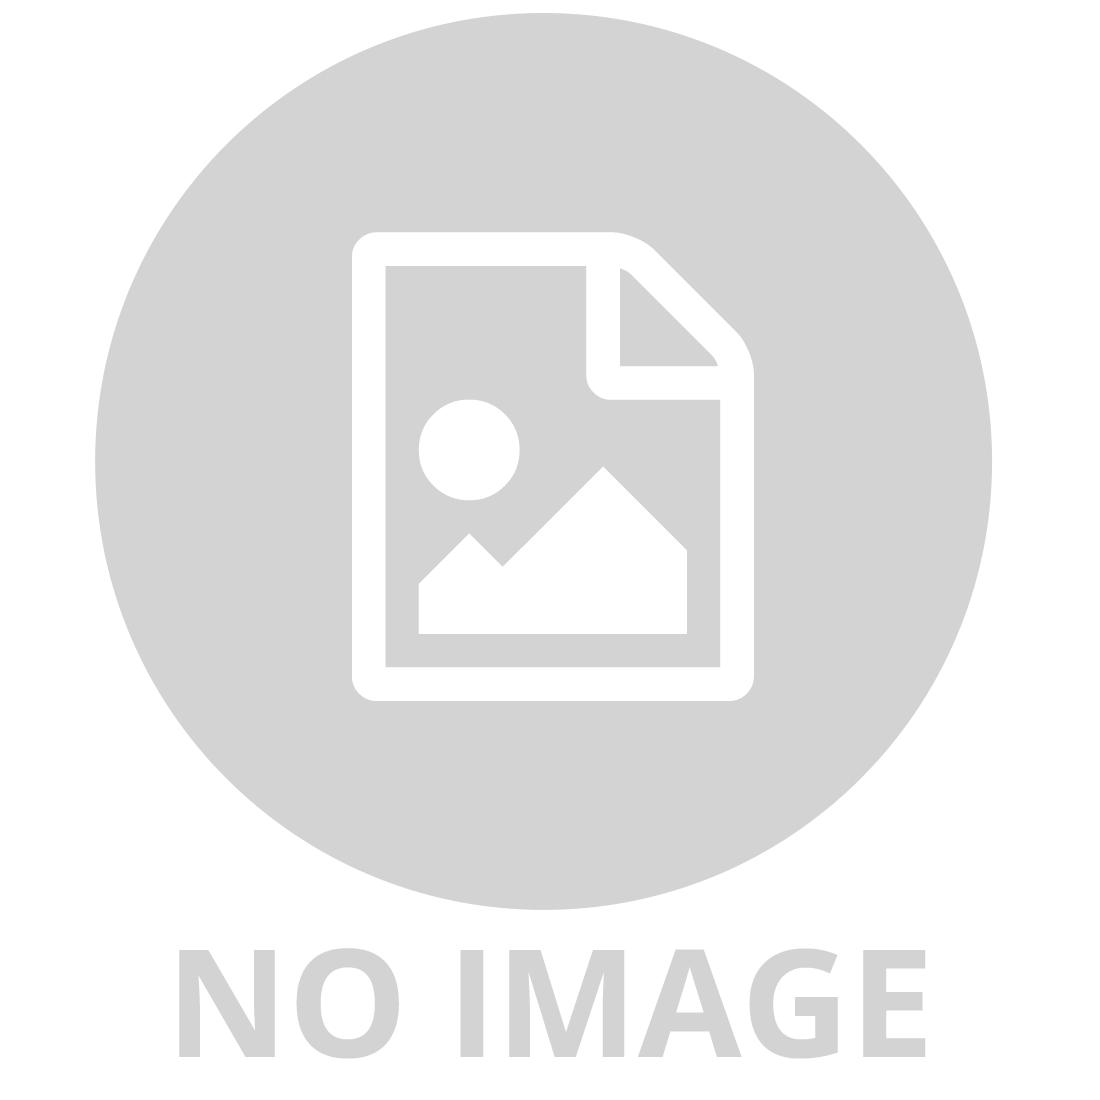 LEGO MARVEL 76147 SPIDERMAN VULTURE'S TRUCKER ROBBERY